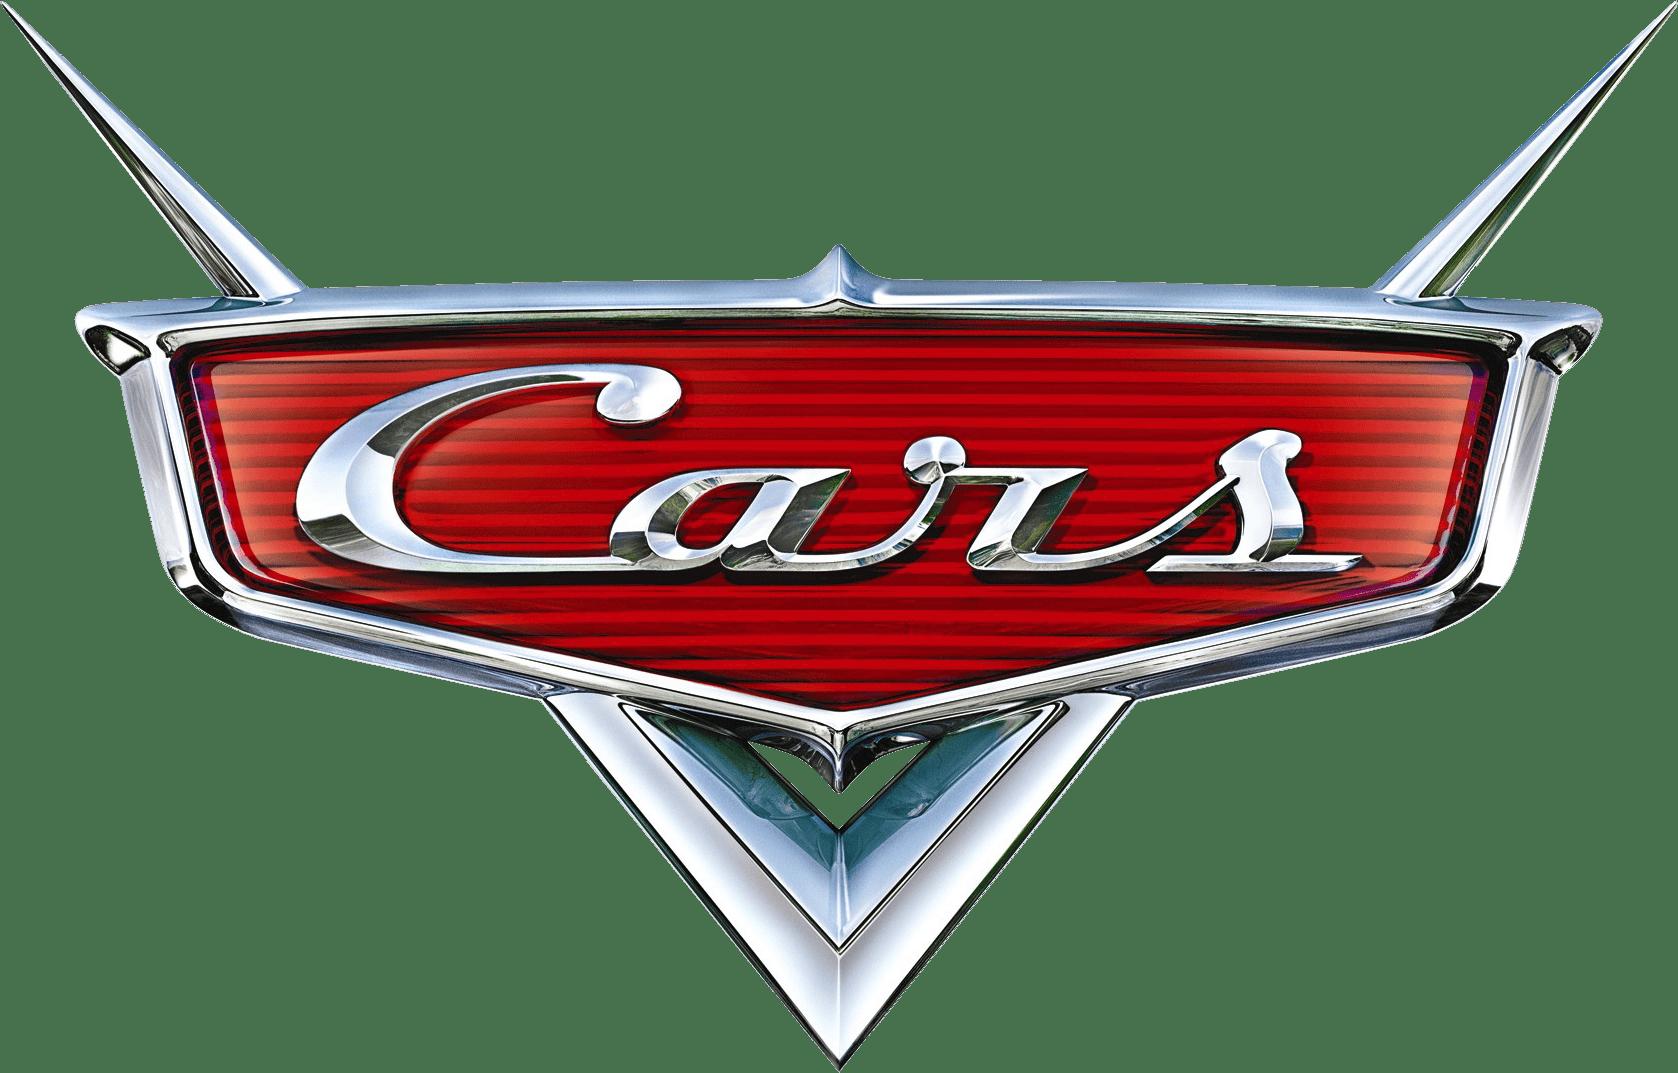 Car emblem clipart picture freeuse download Cars Pixar Movie Logo transparent PNG - StickPNG picture freeuse download